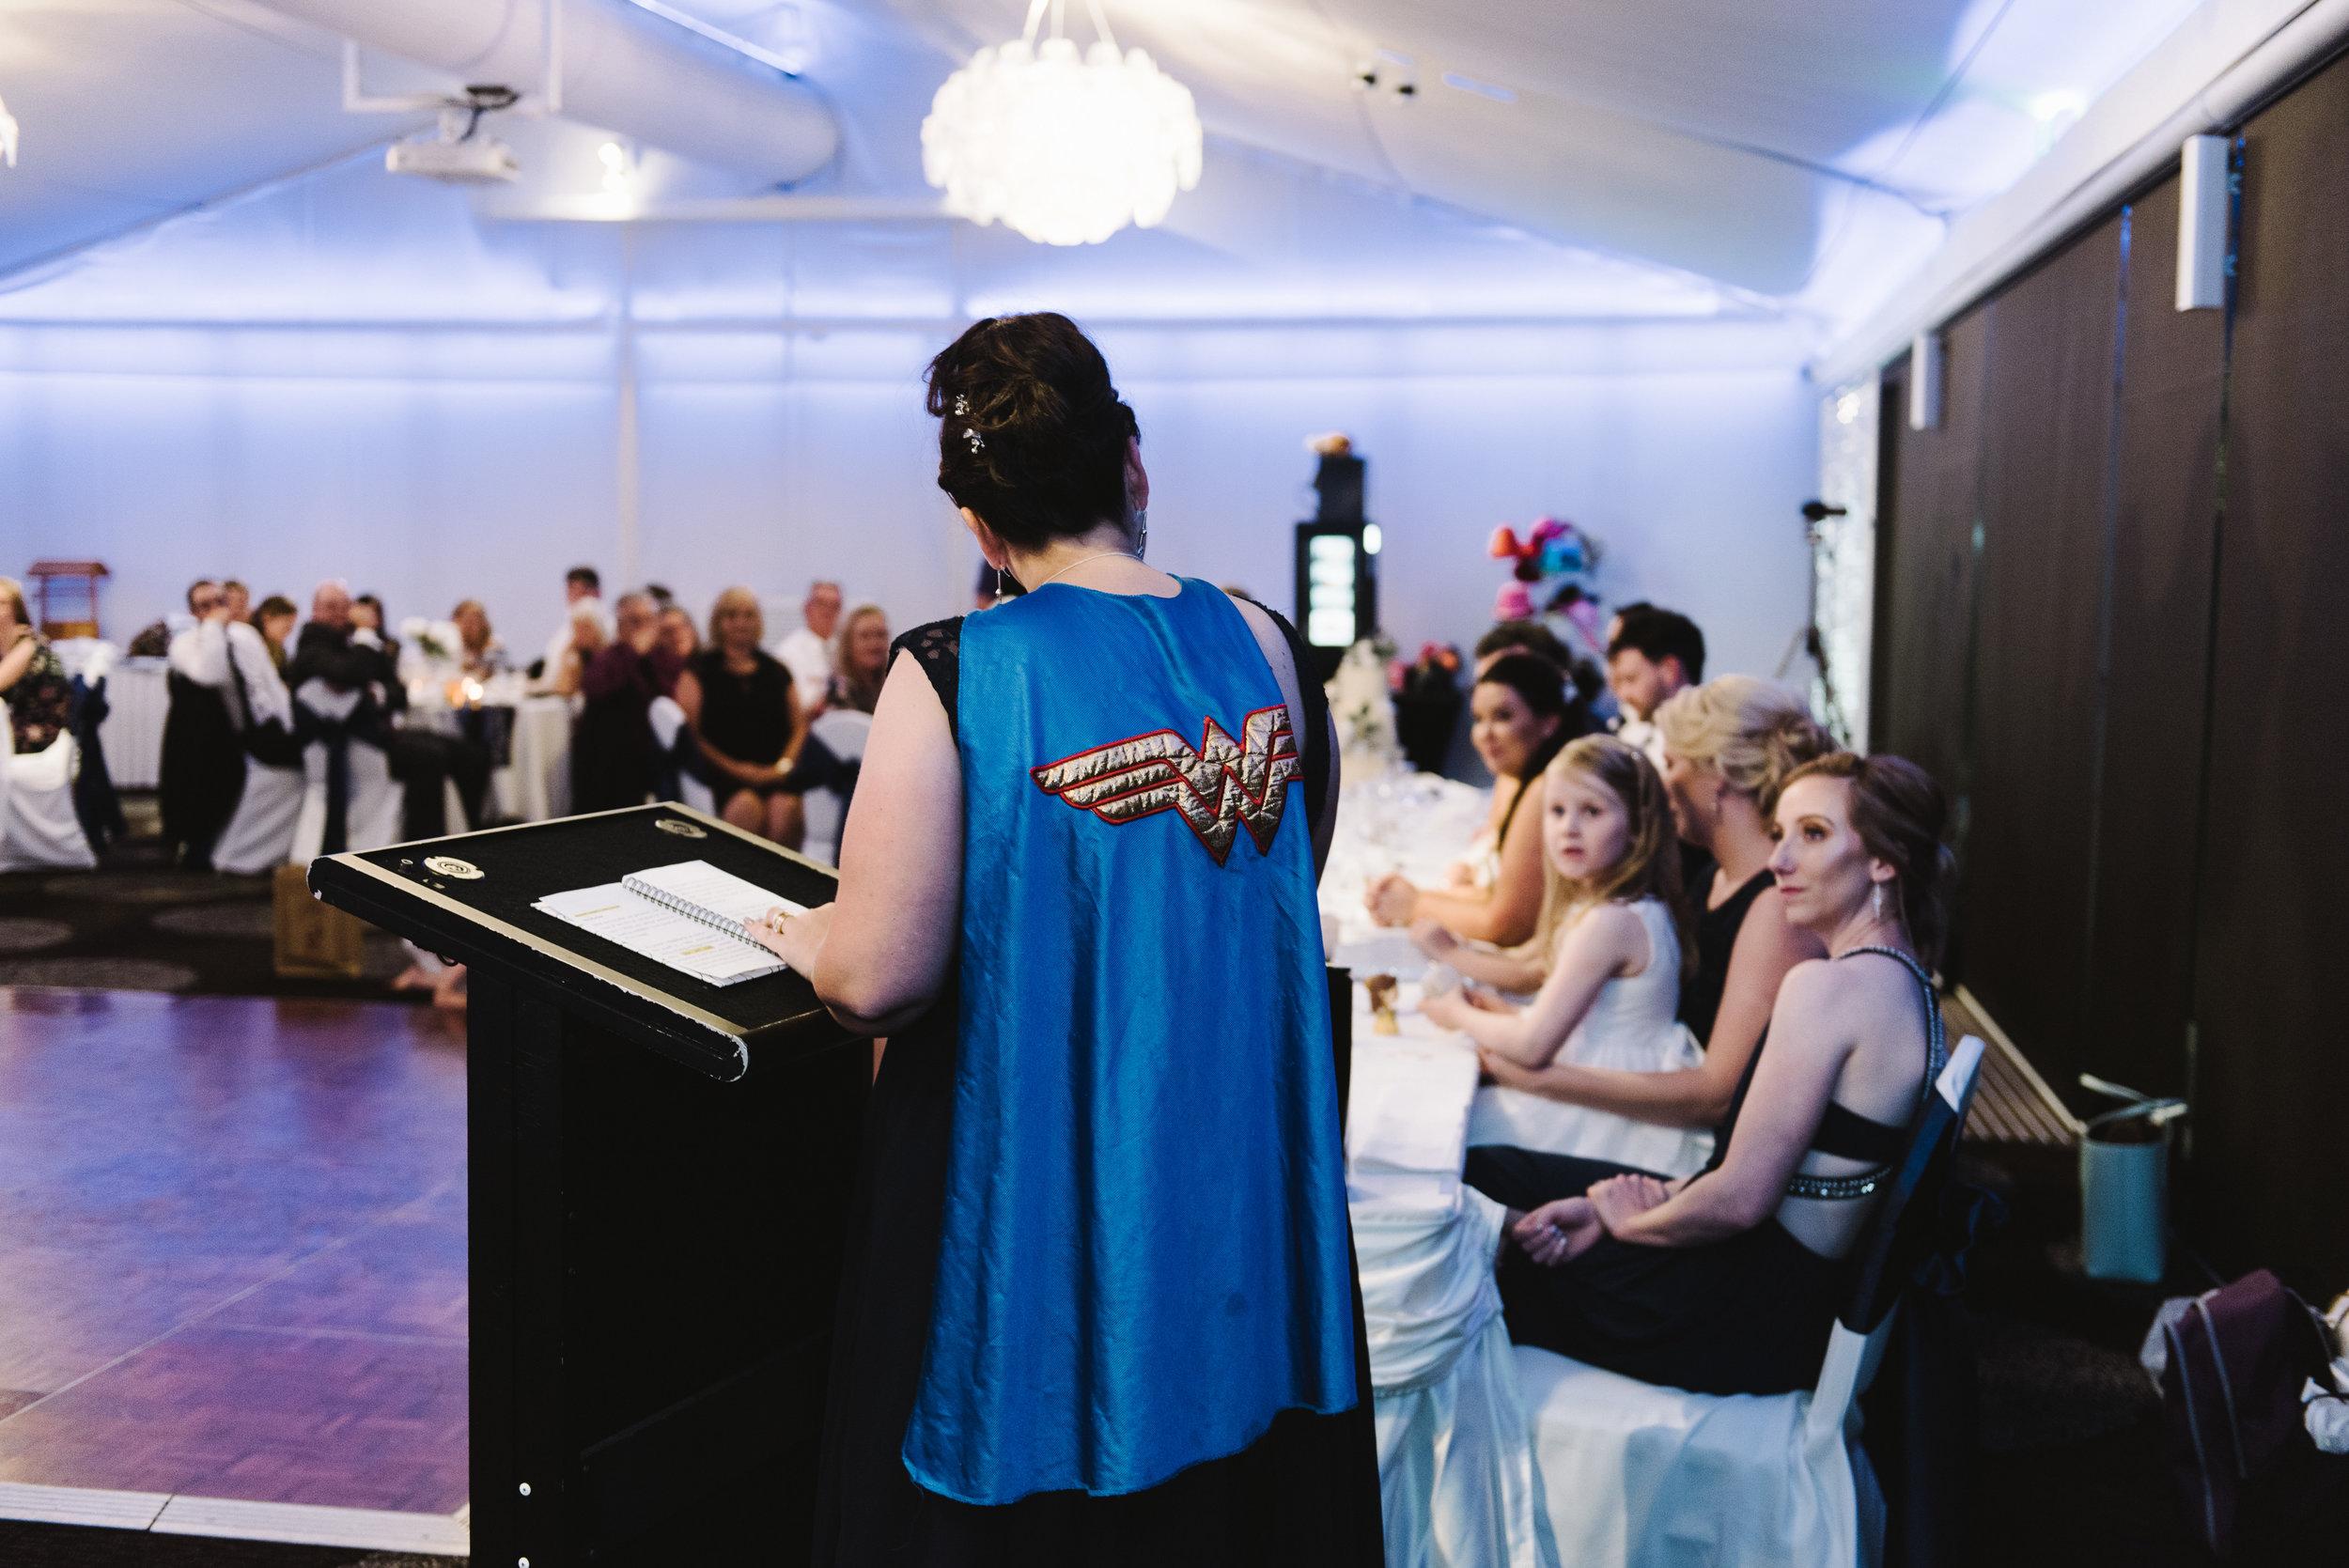 brisbane-wedding-photographer-106.jpg